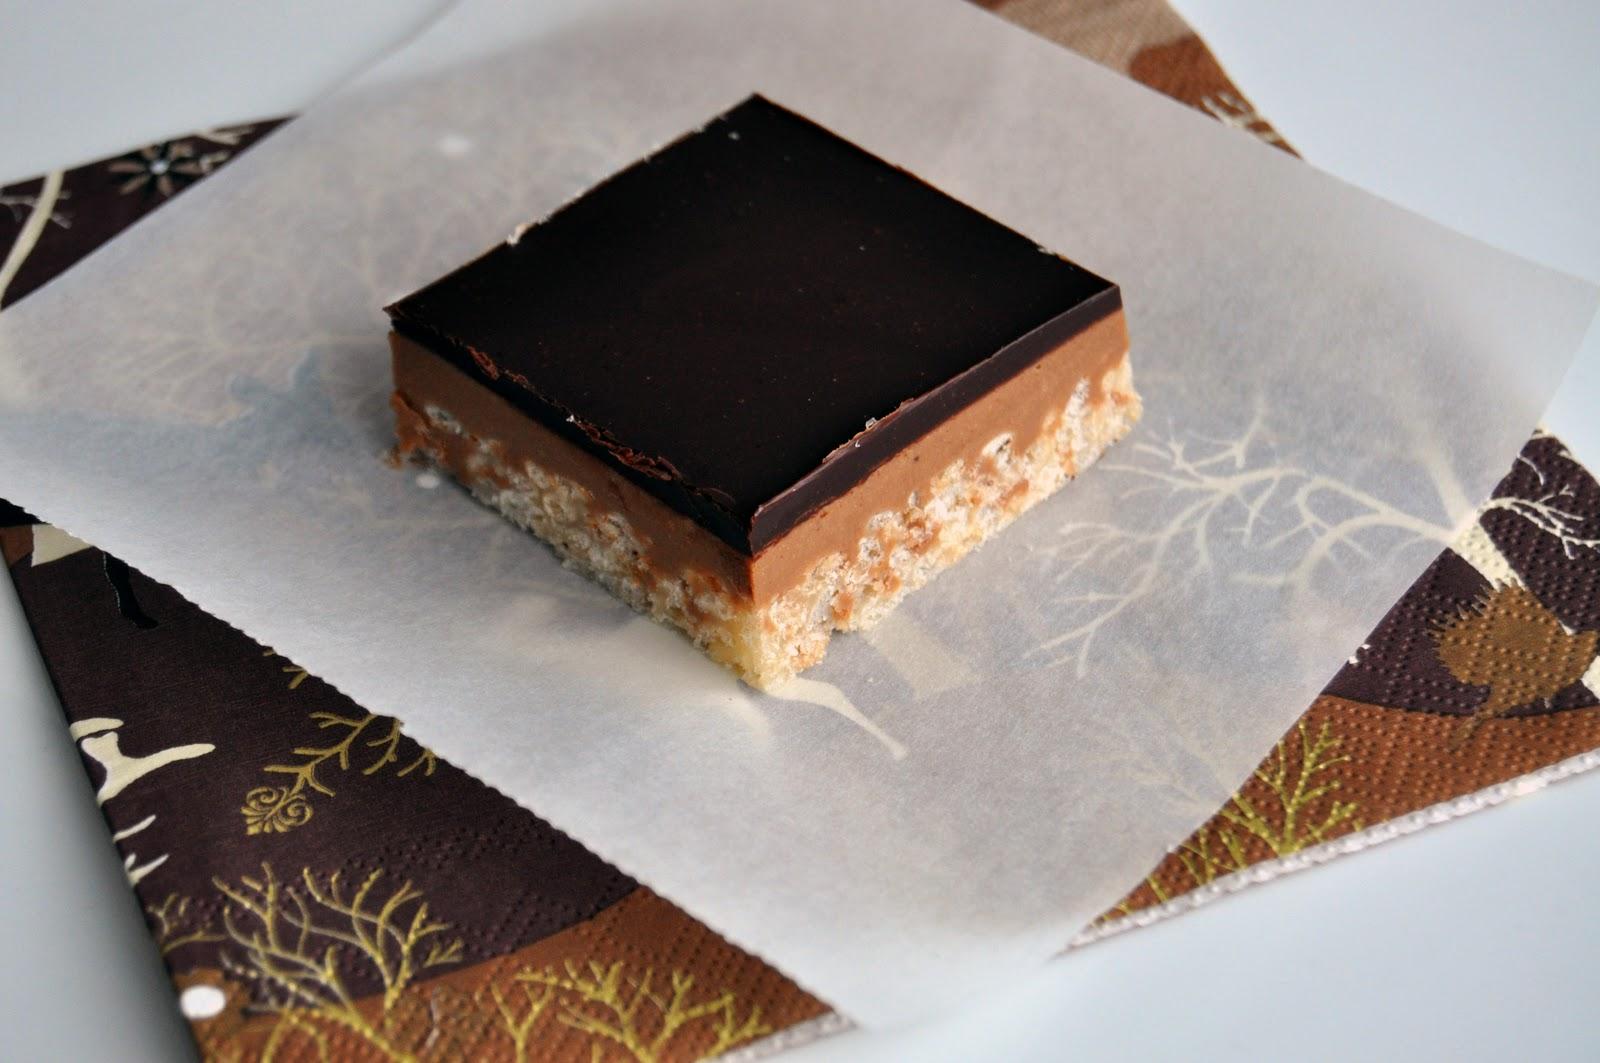 Impeccable Taste: Peanut Butter Crispy Bars